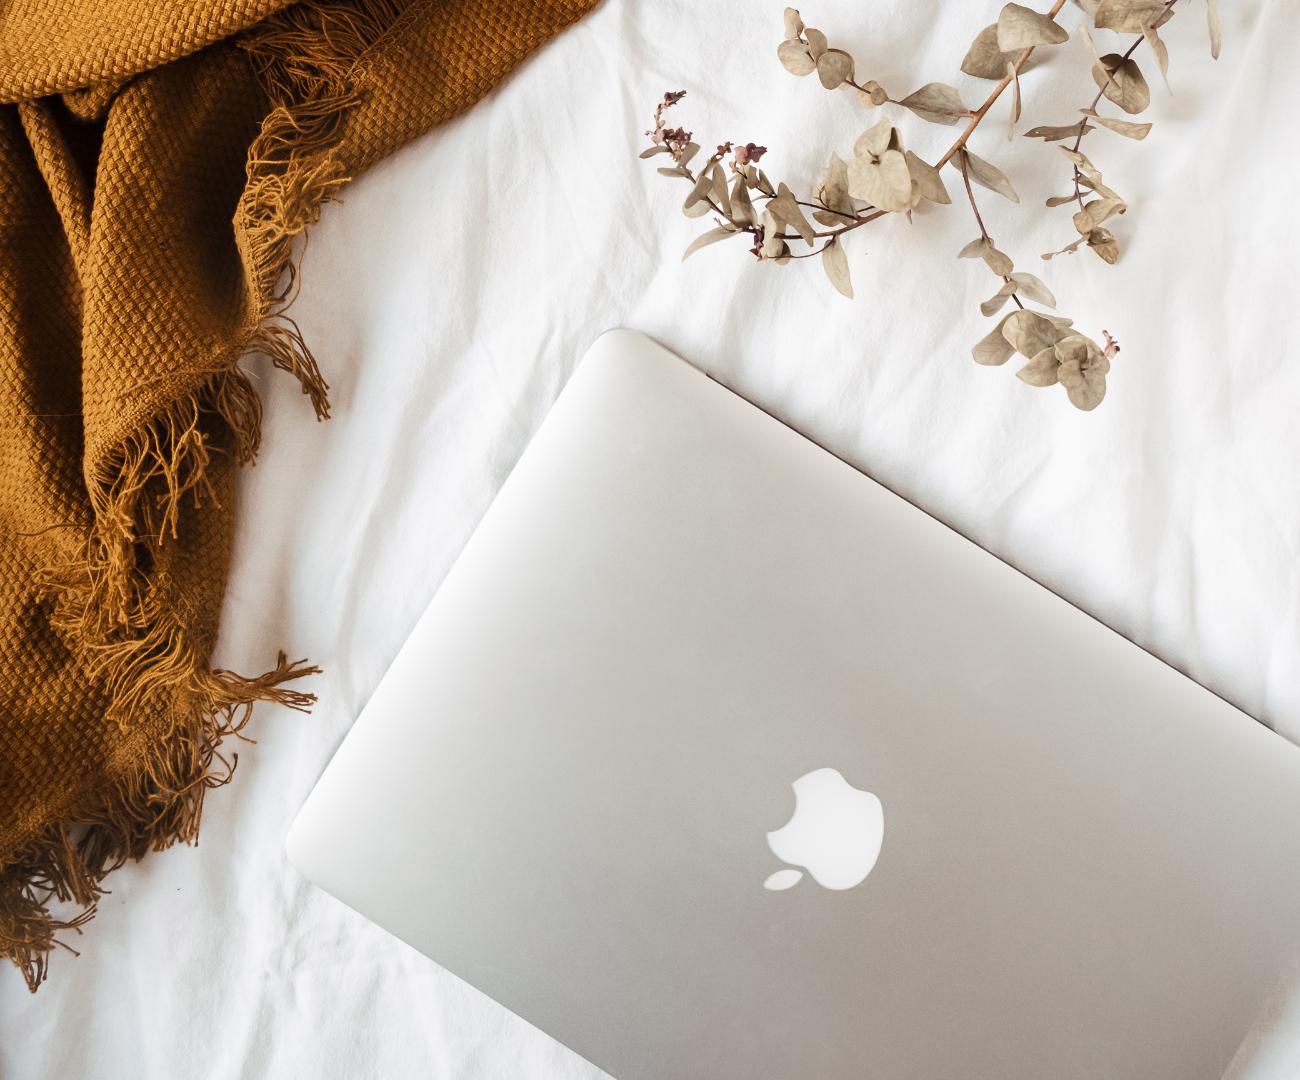 moms blogging course